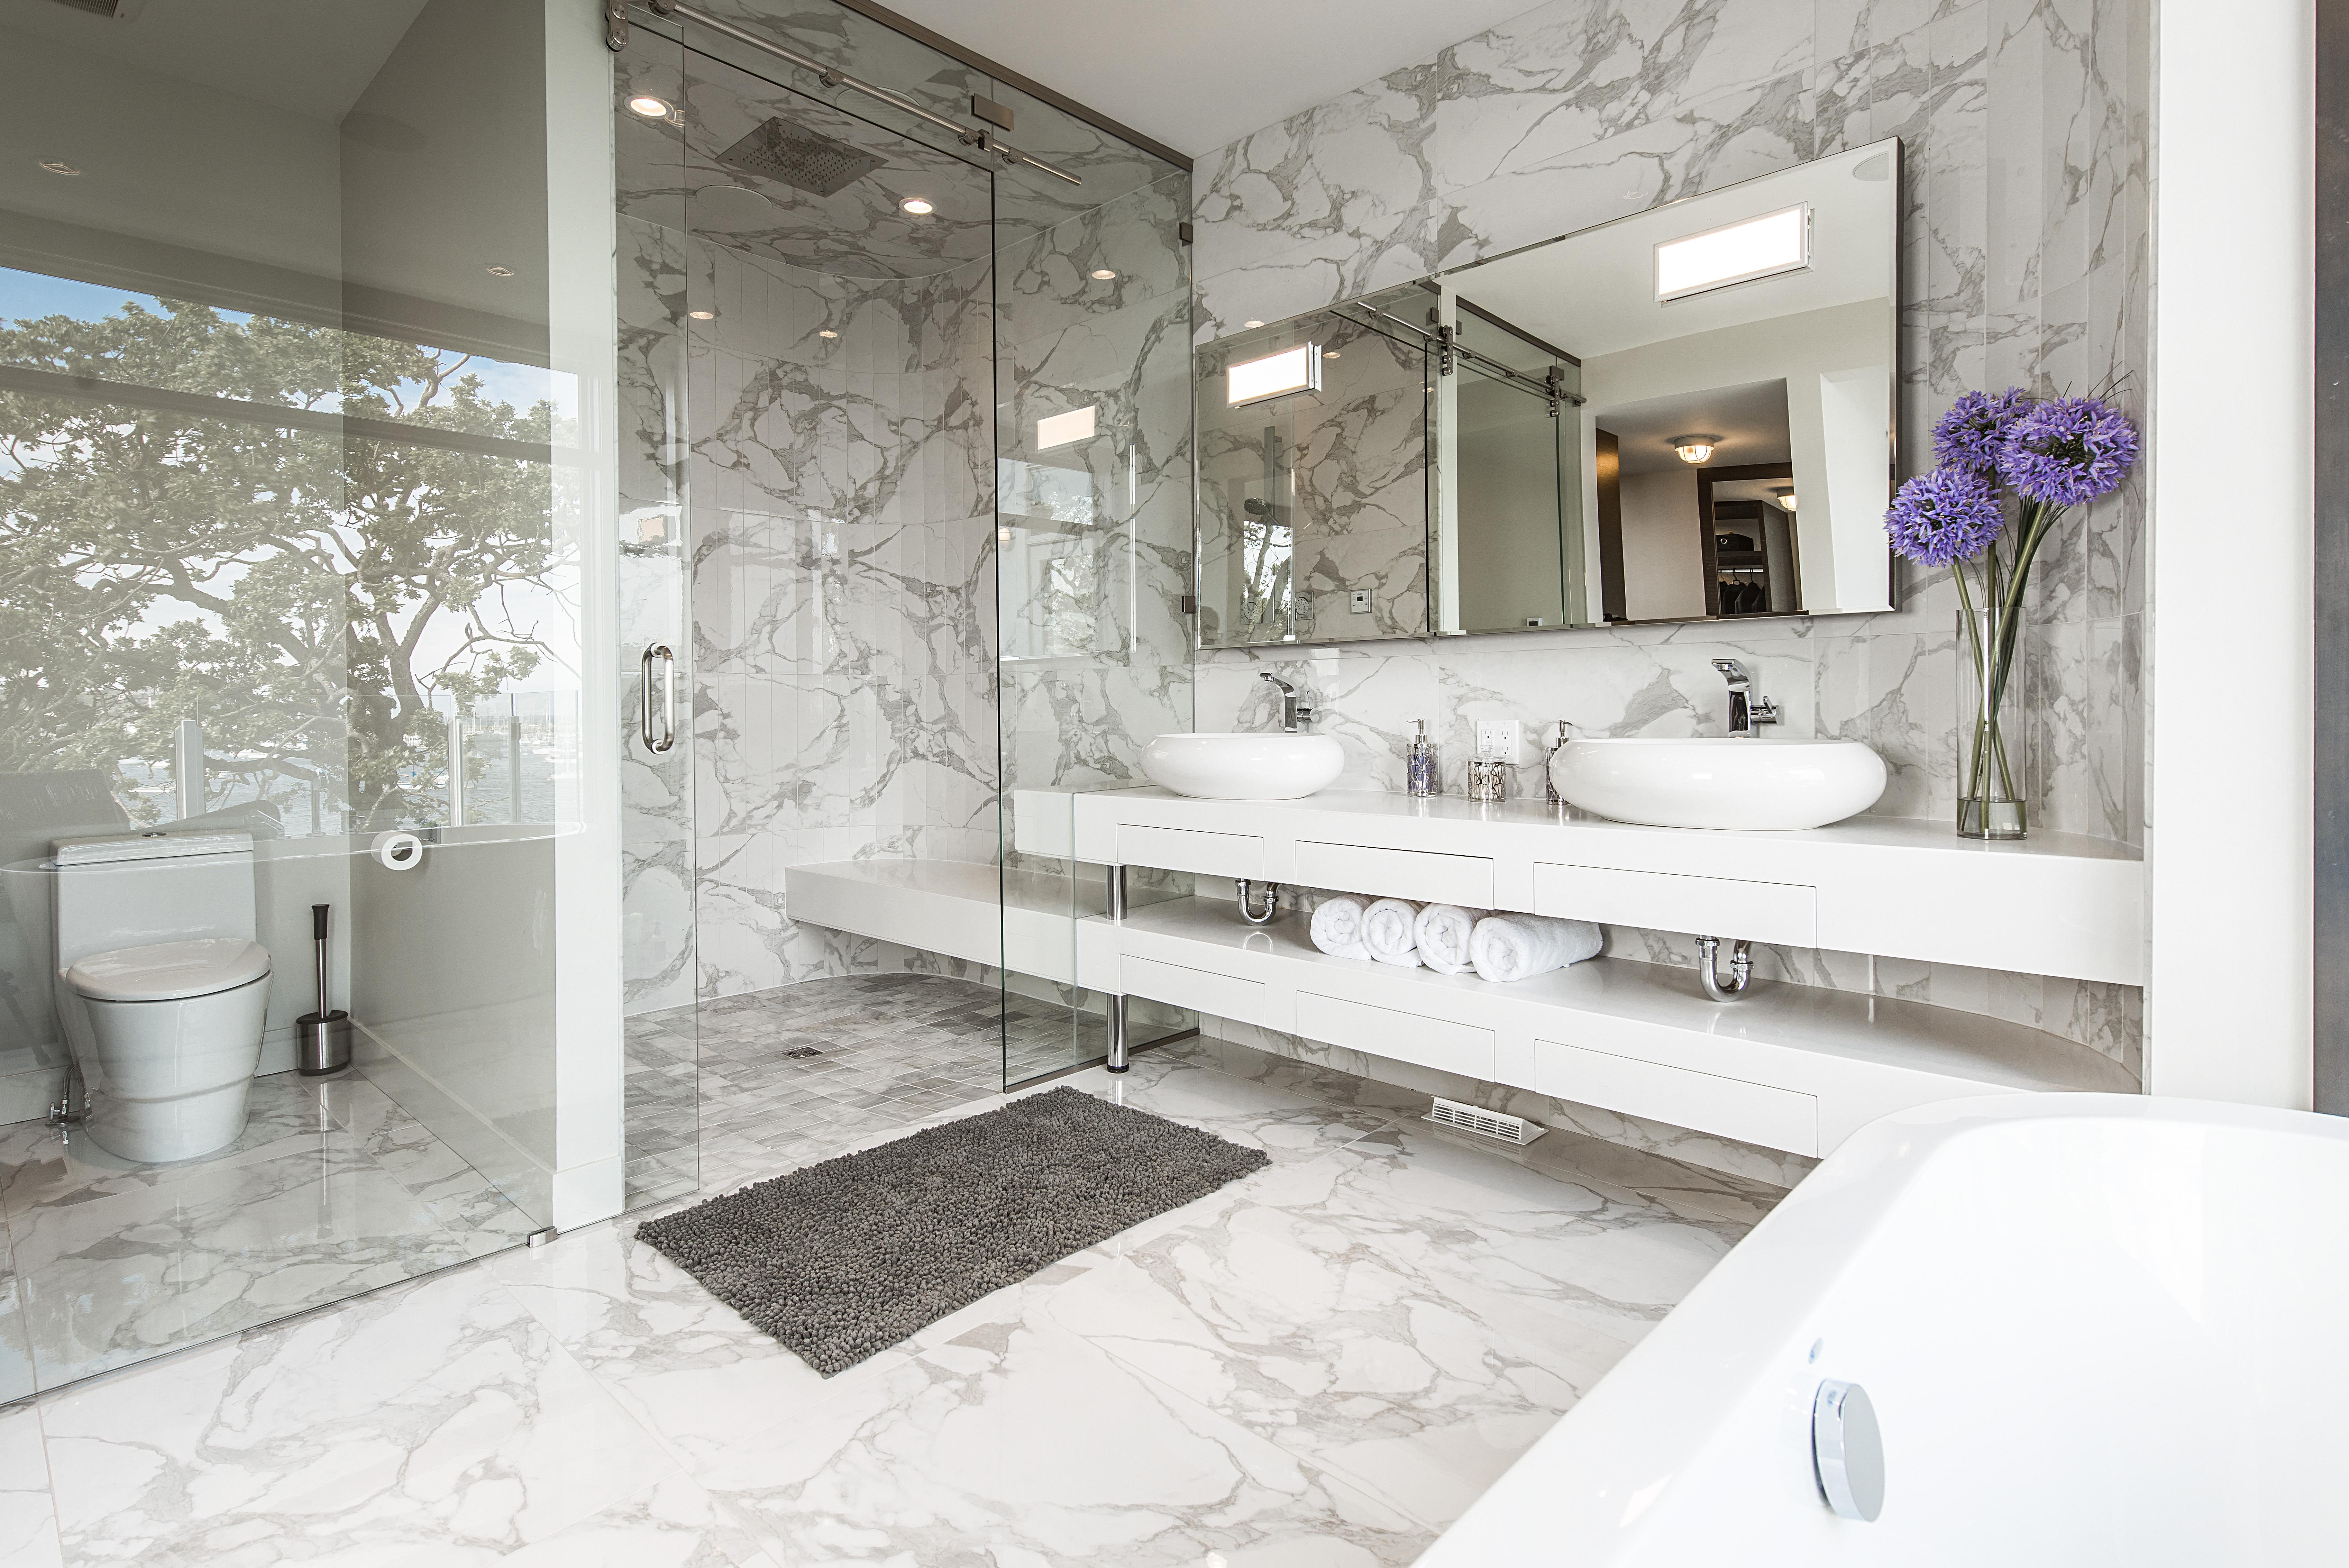 Somass - Bathroom